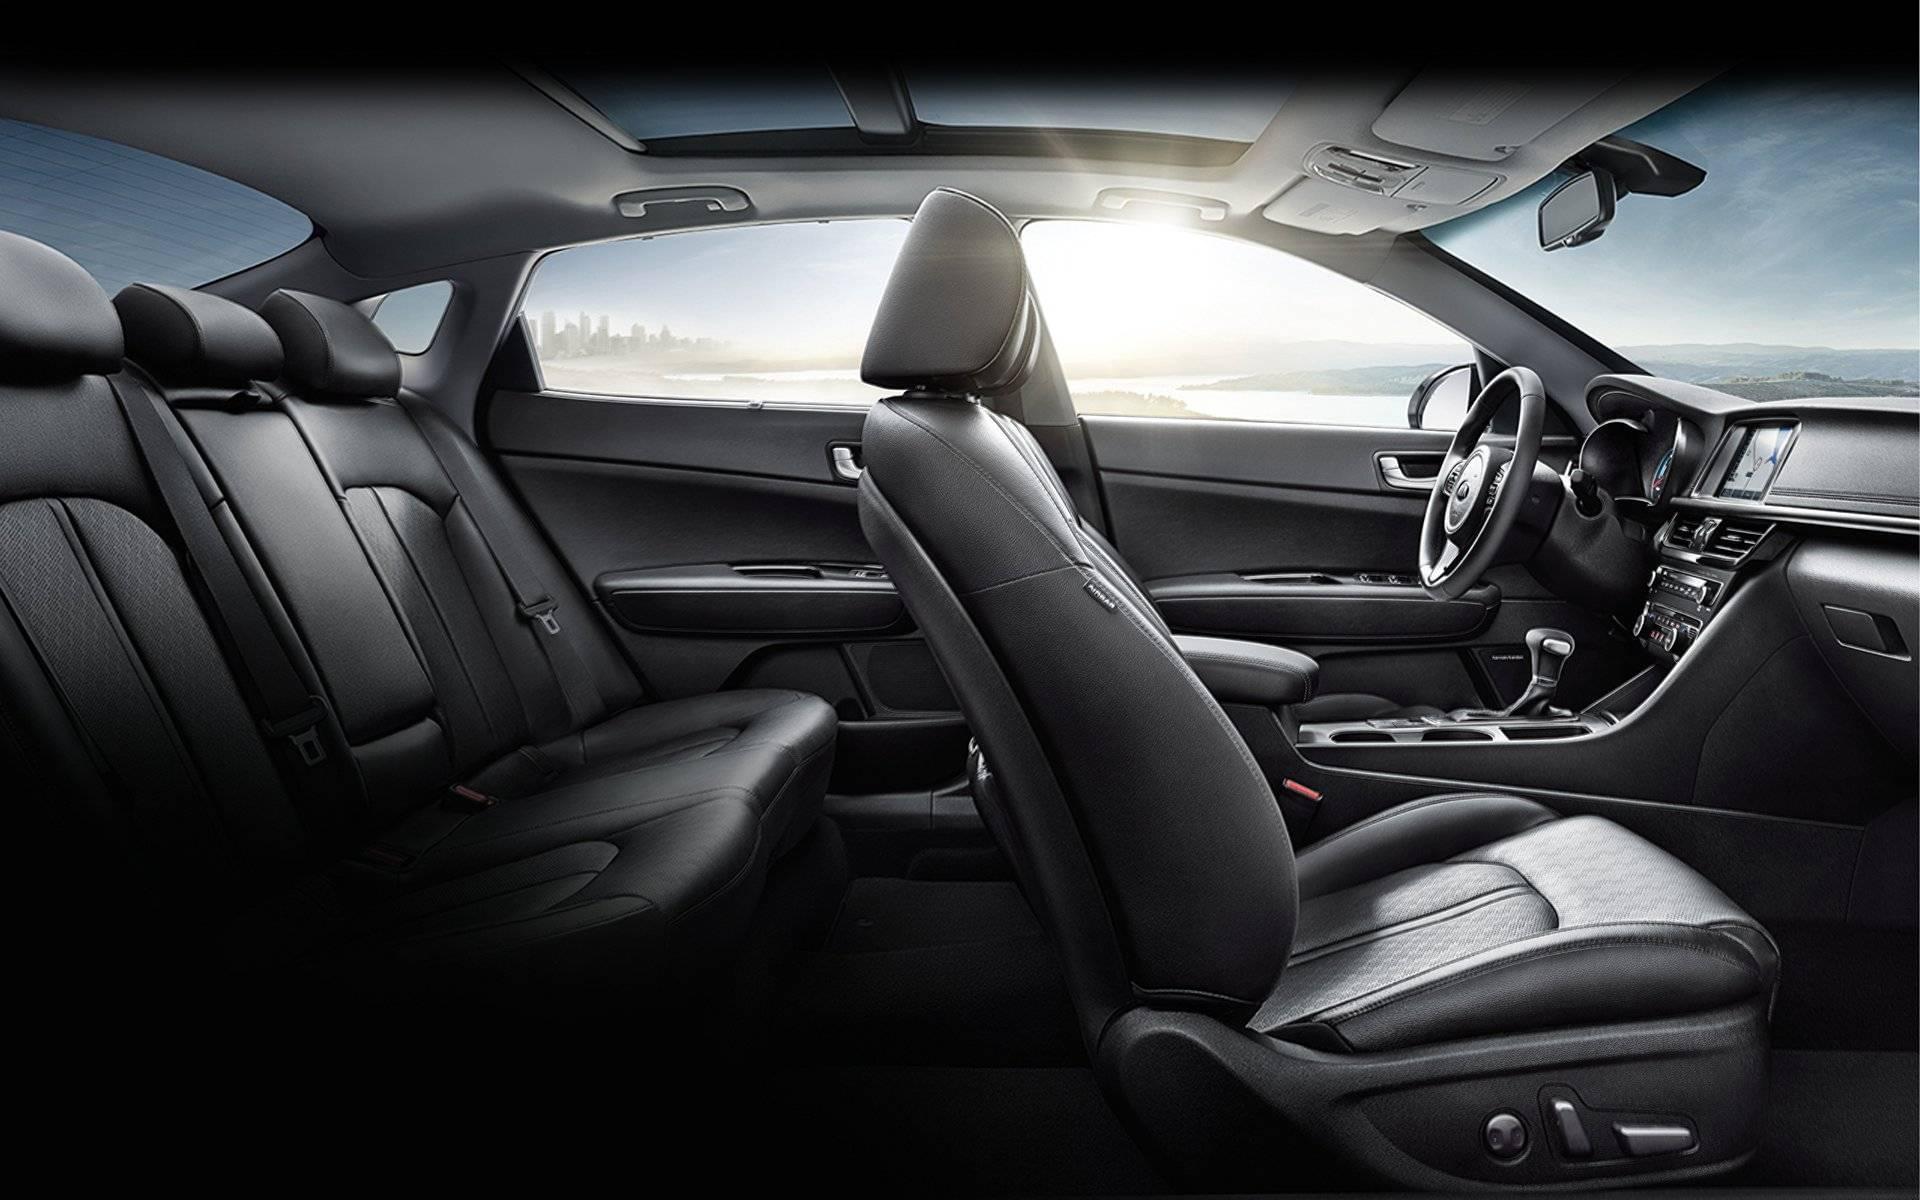 Background Optima Hybrid 2017 Interior Overview-kia-1920x-jpg